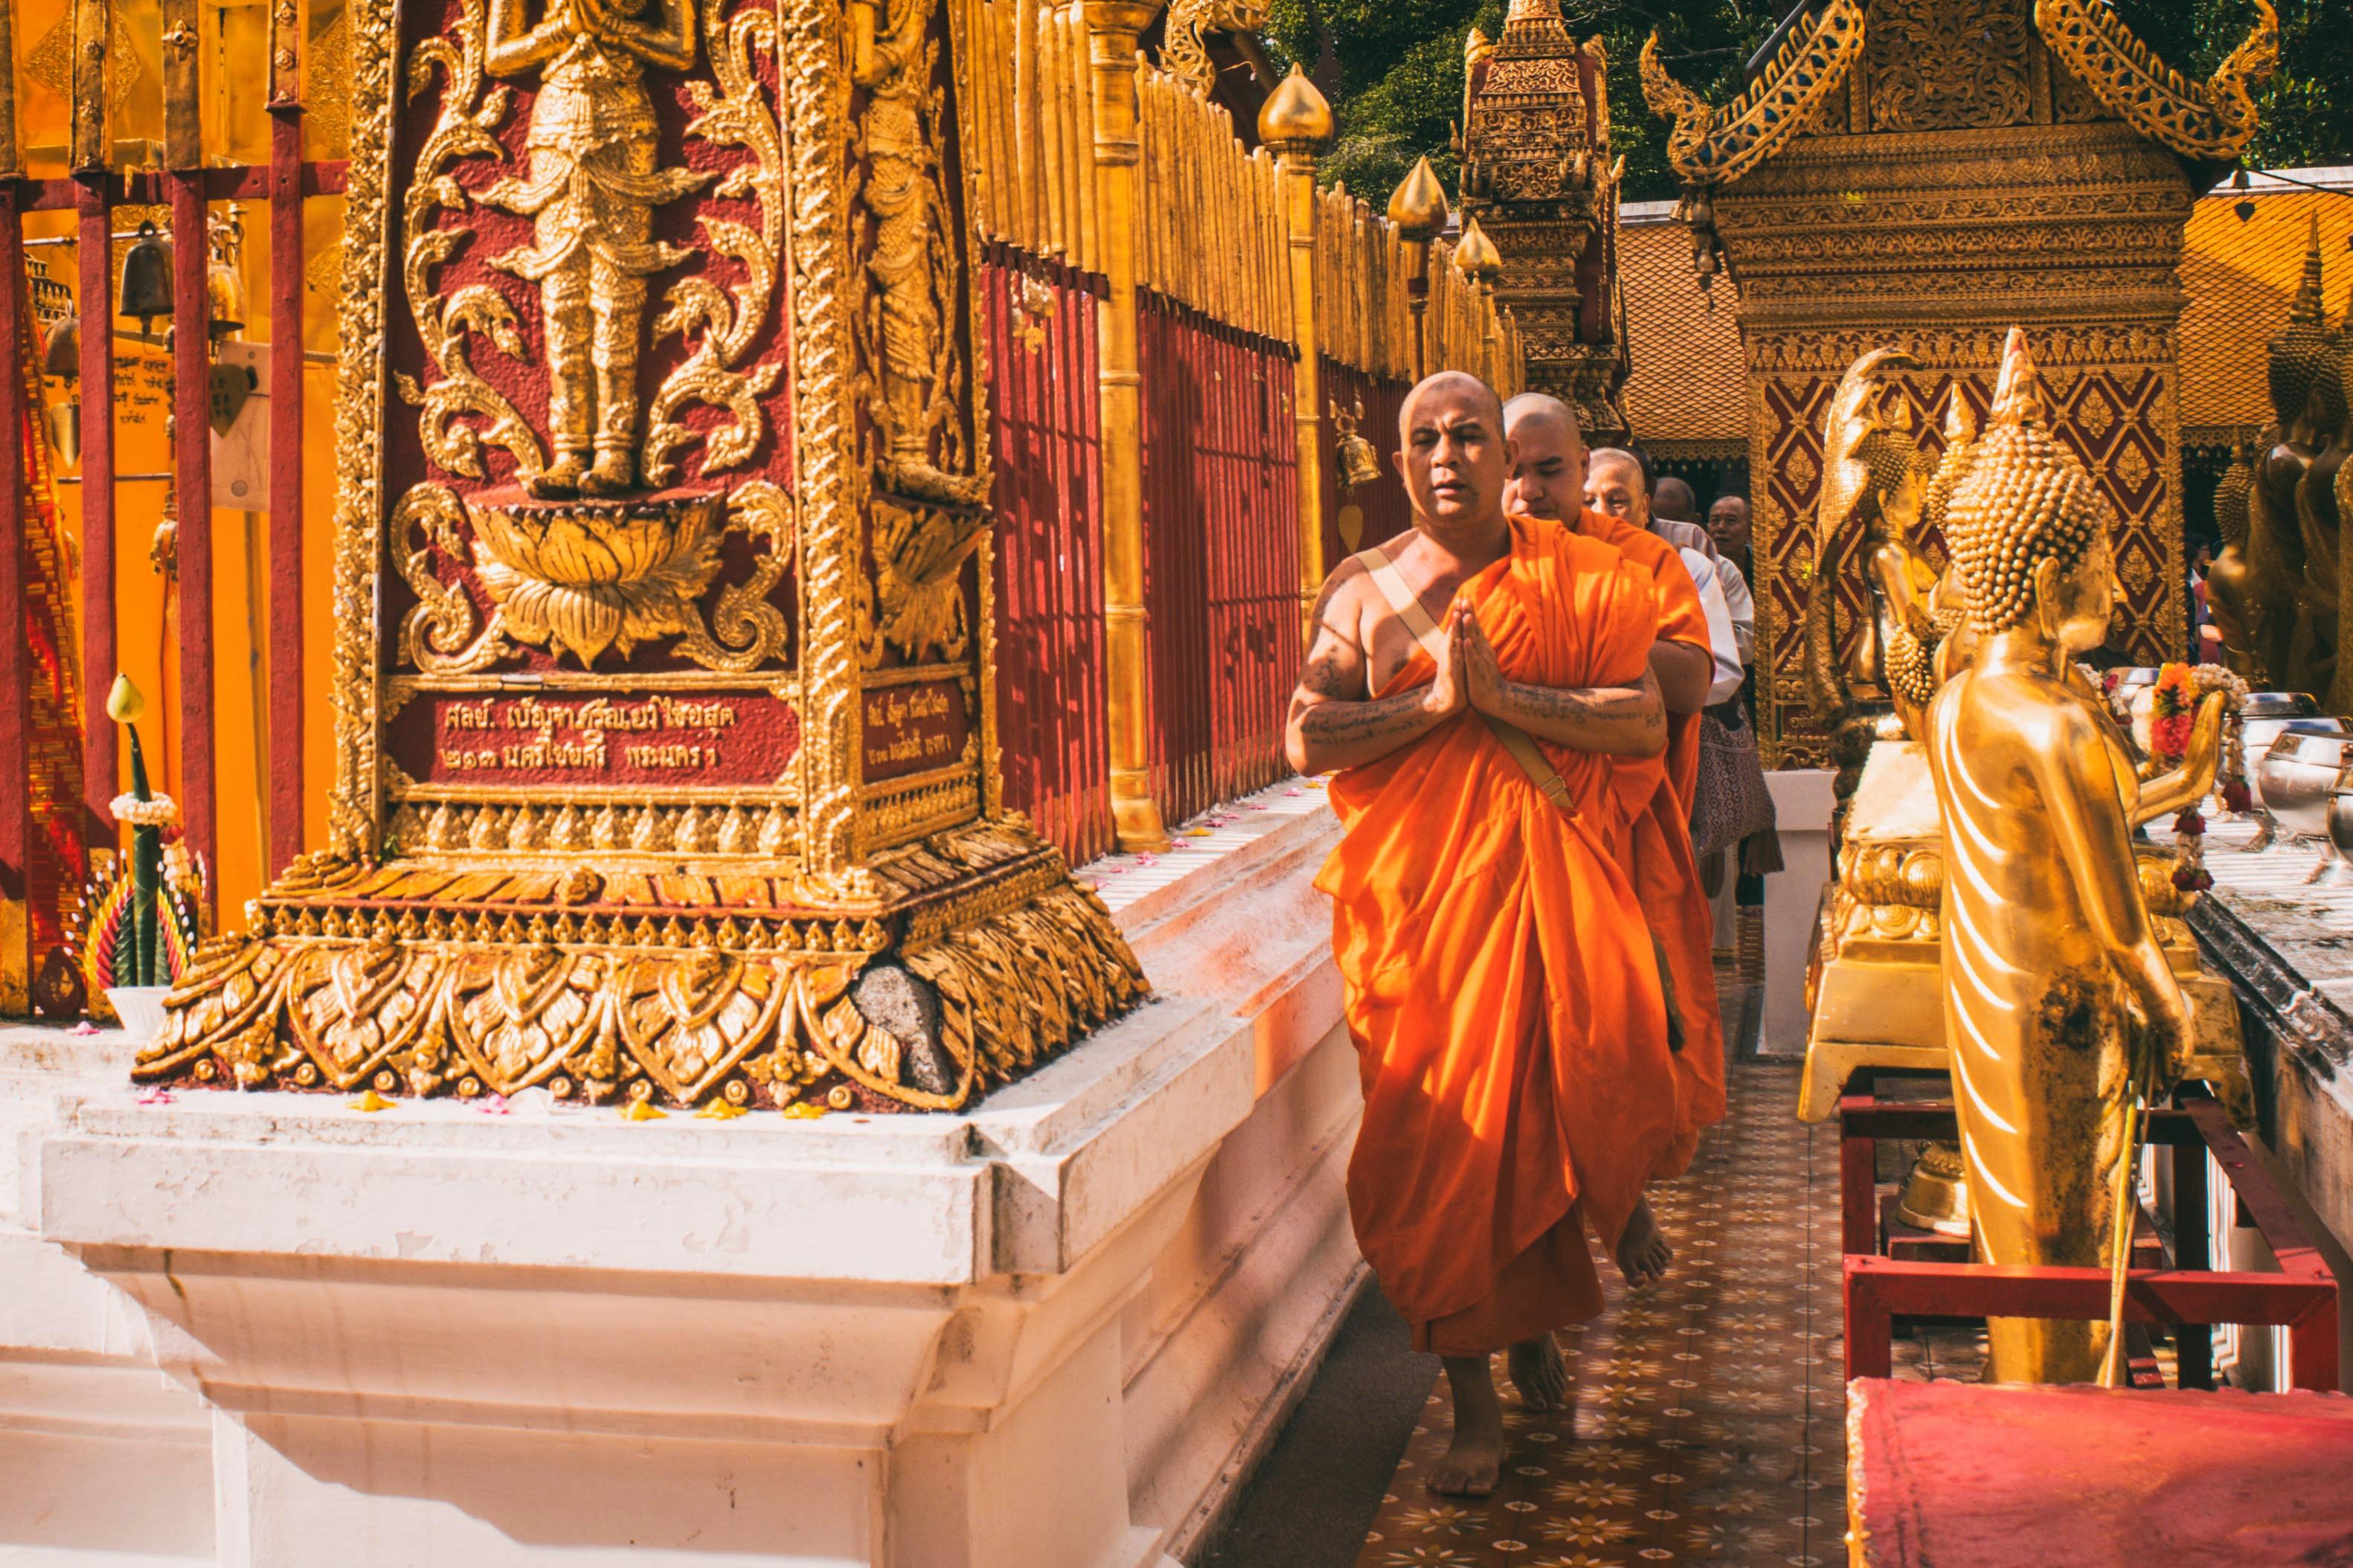 Doi Suthep, Chiang Mai, Thailand